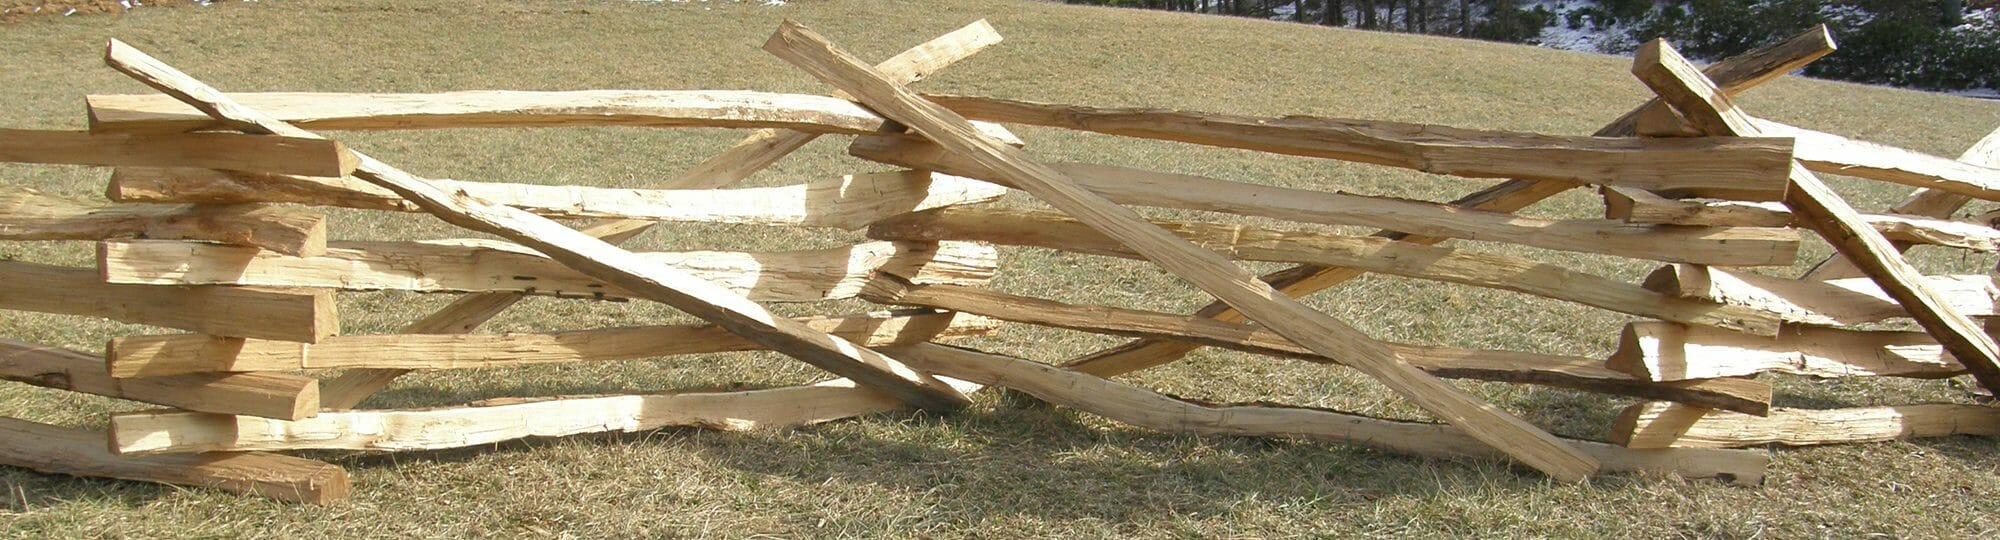 Authentic Split Rail Fence Posts and Rails | Bark House